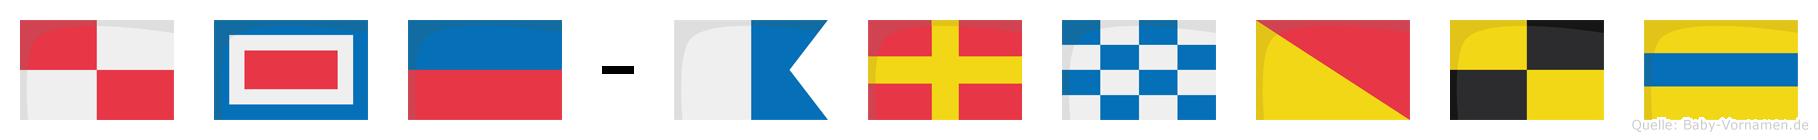 Uwe-Arnold im Flaggenalphabet